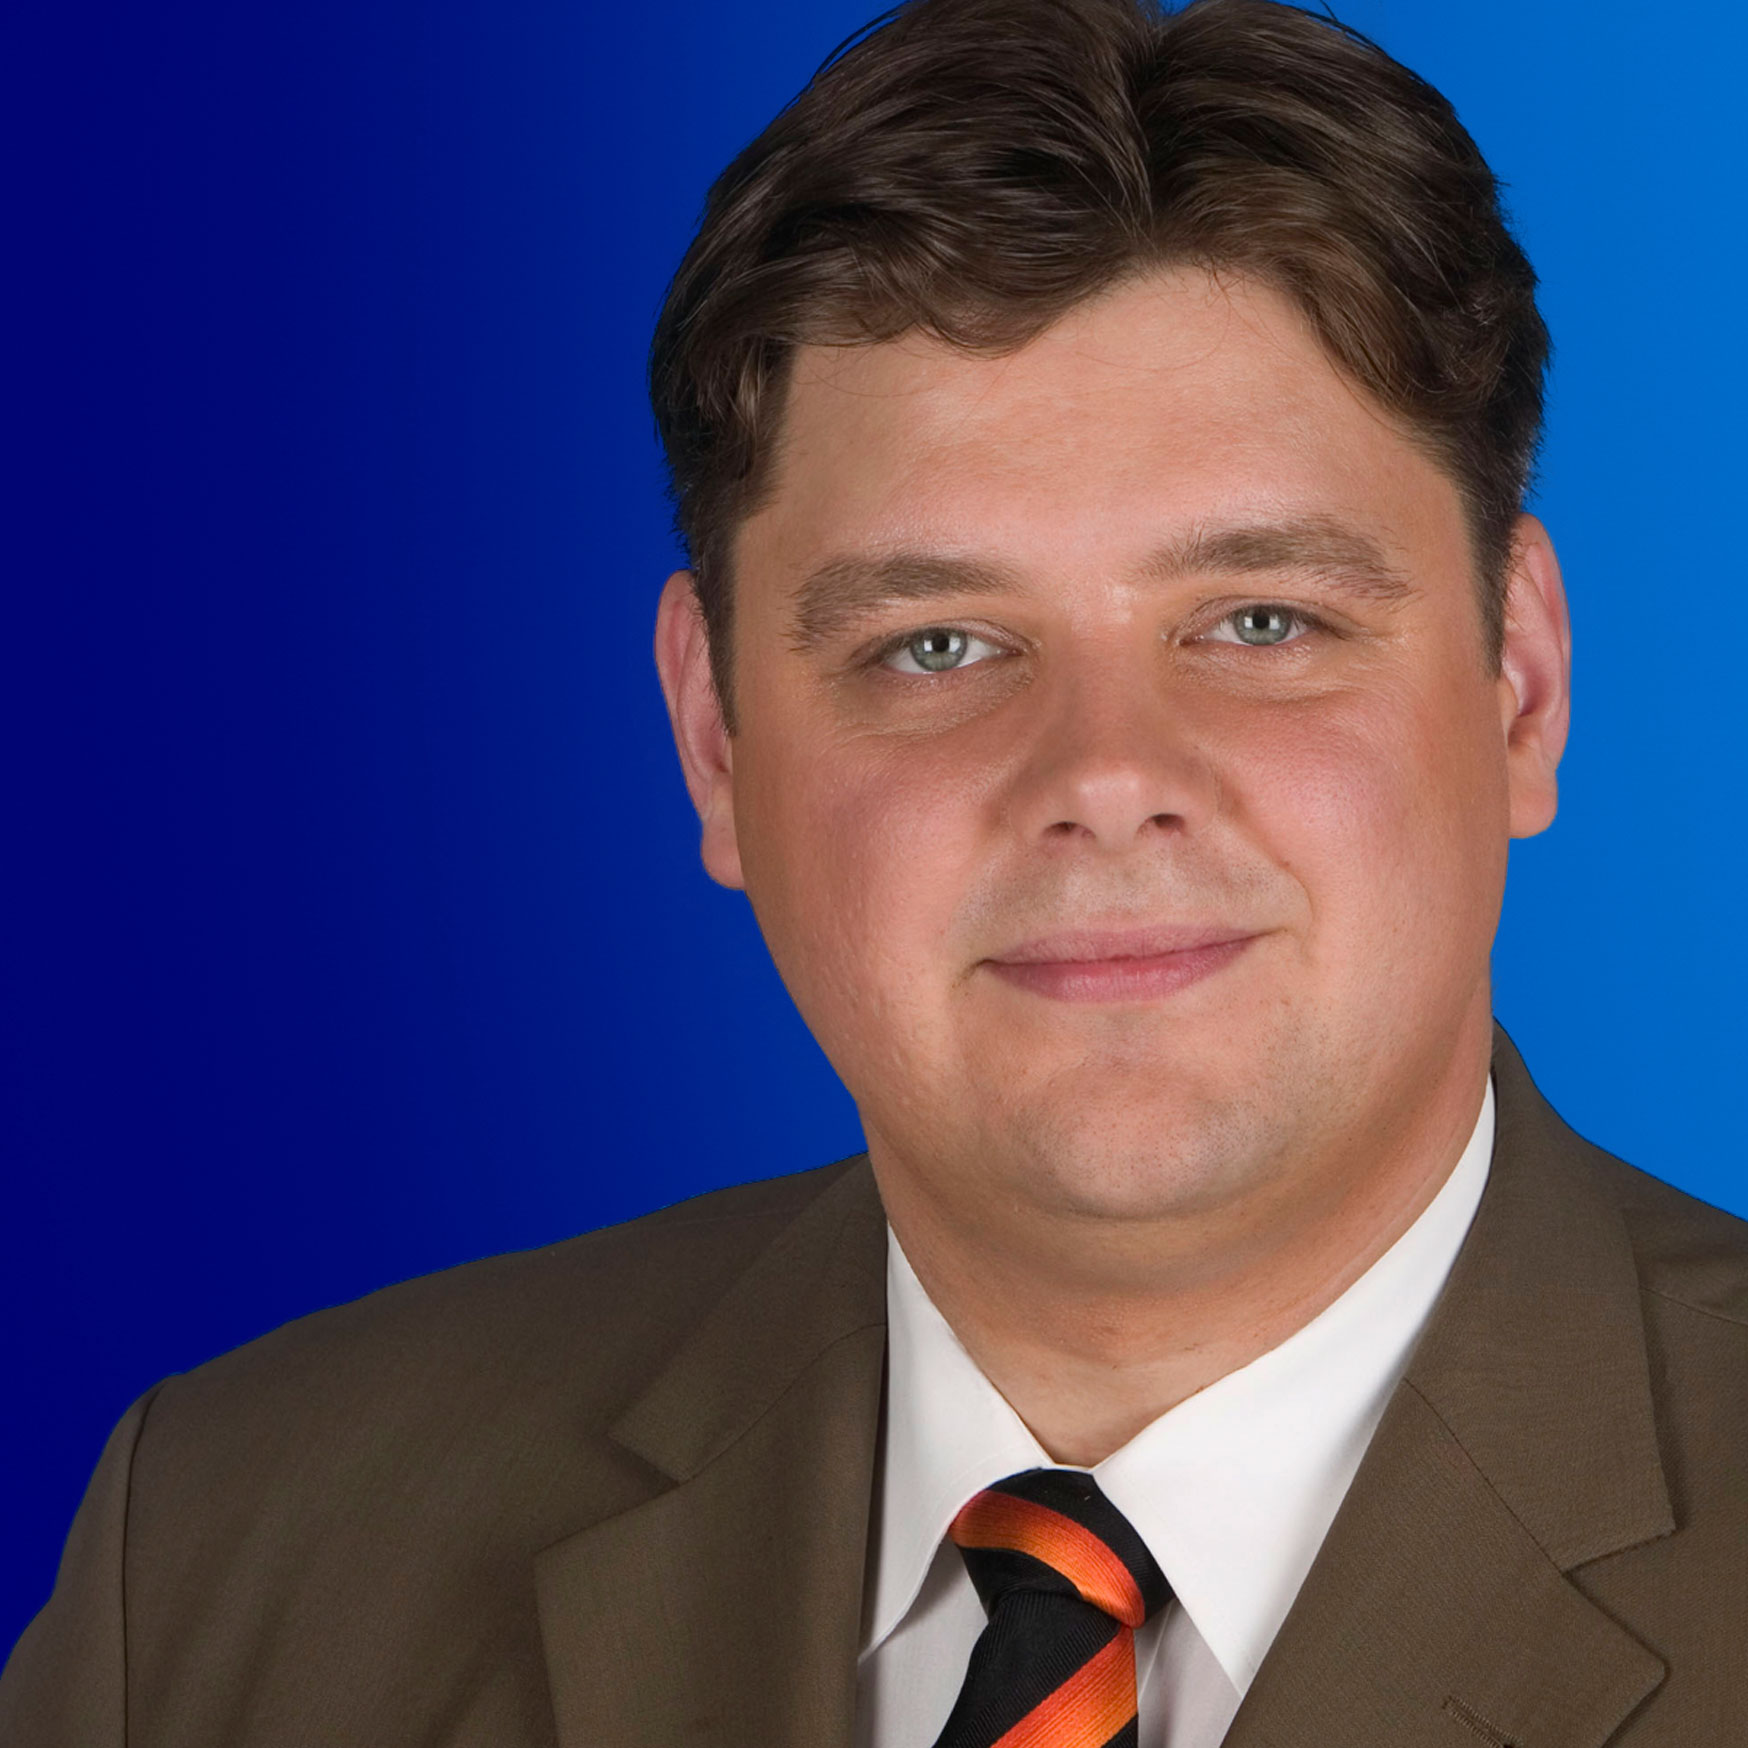 Parlamentarischer Geschäftsführer Jens Nacke MdL